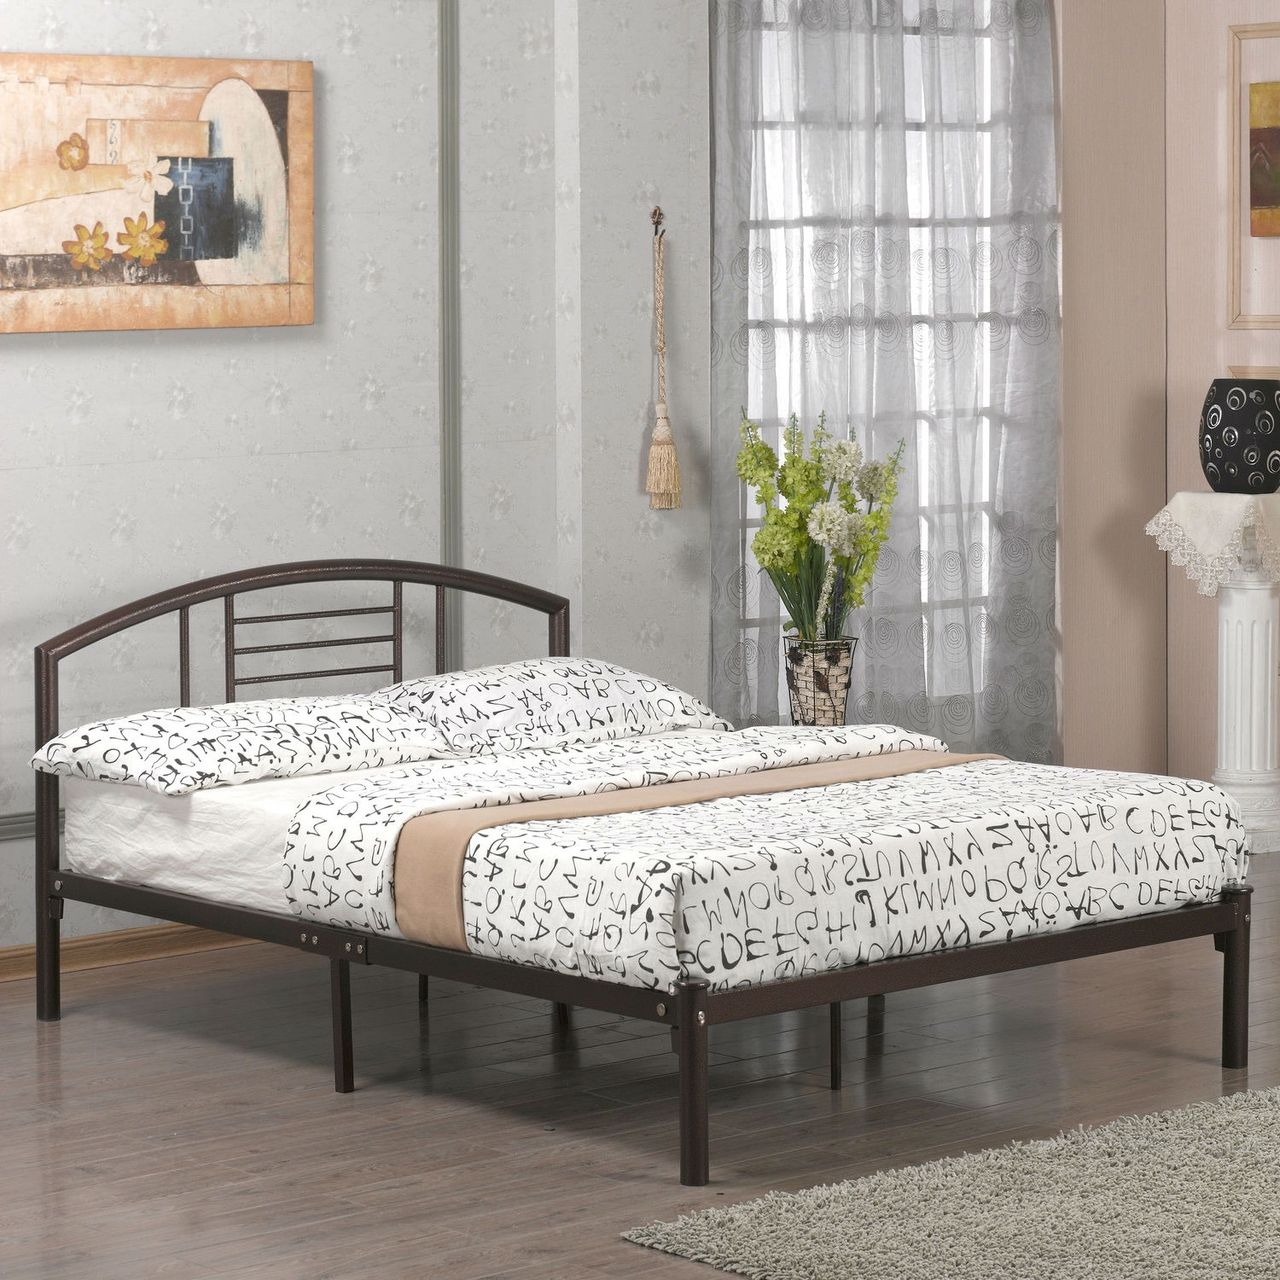 Queen Contemporary Metal Platform Bed Frame, Headboard